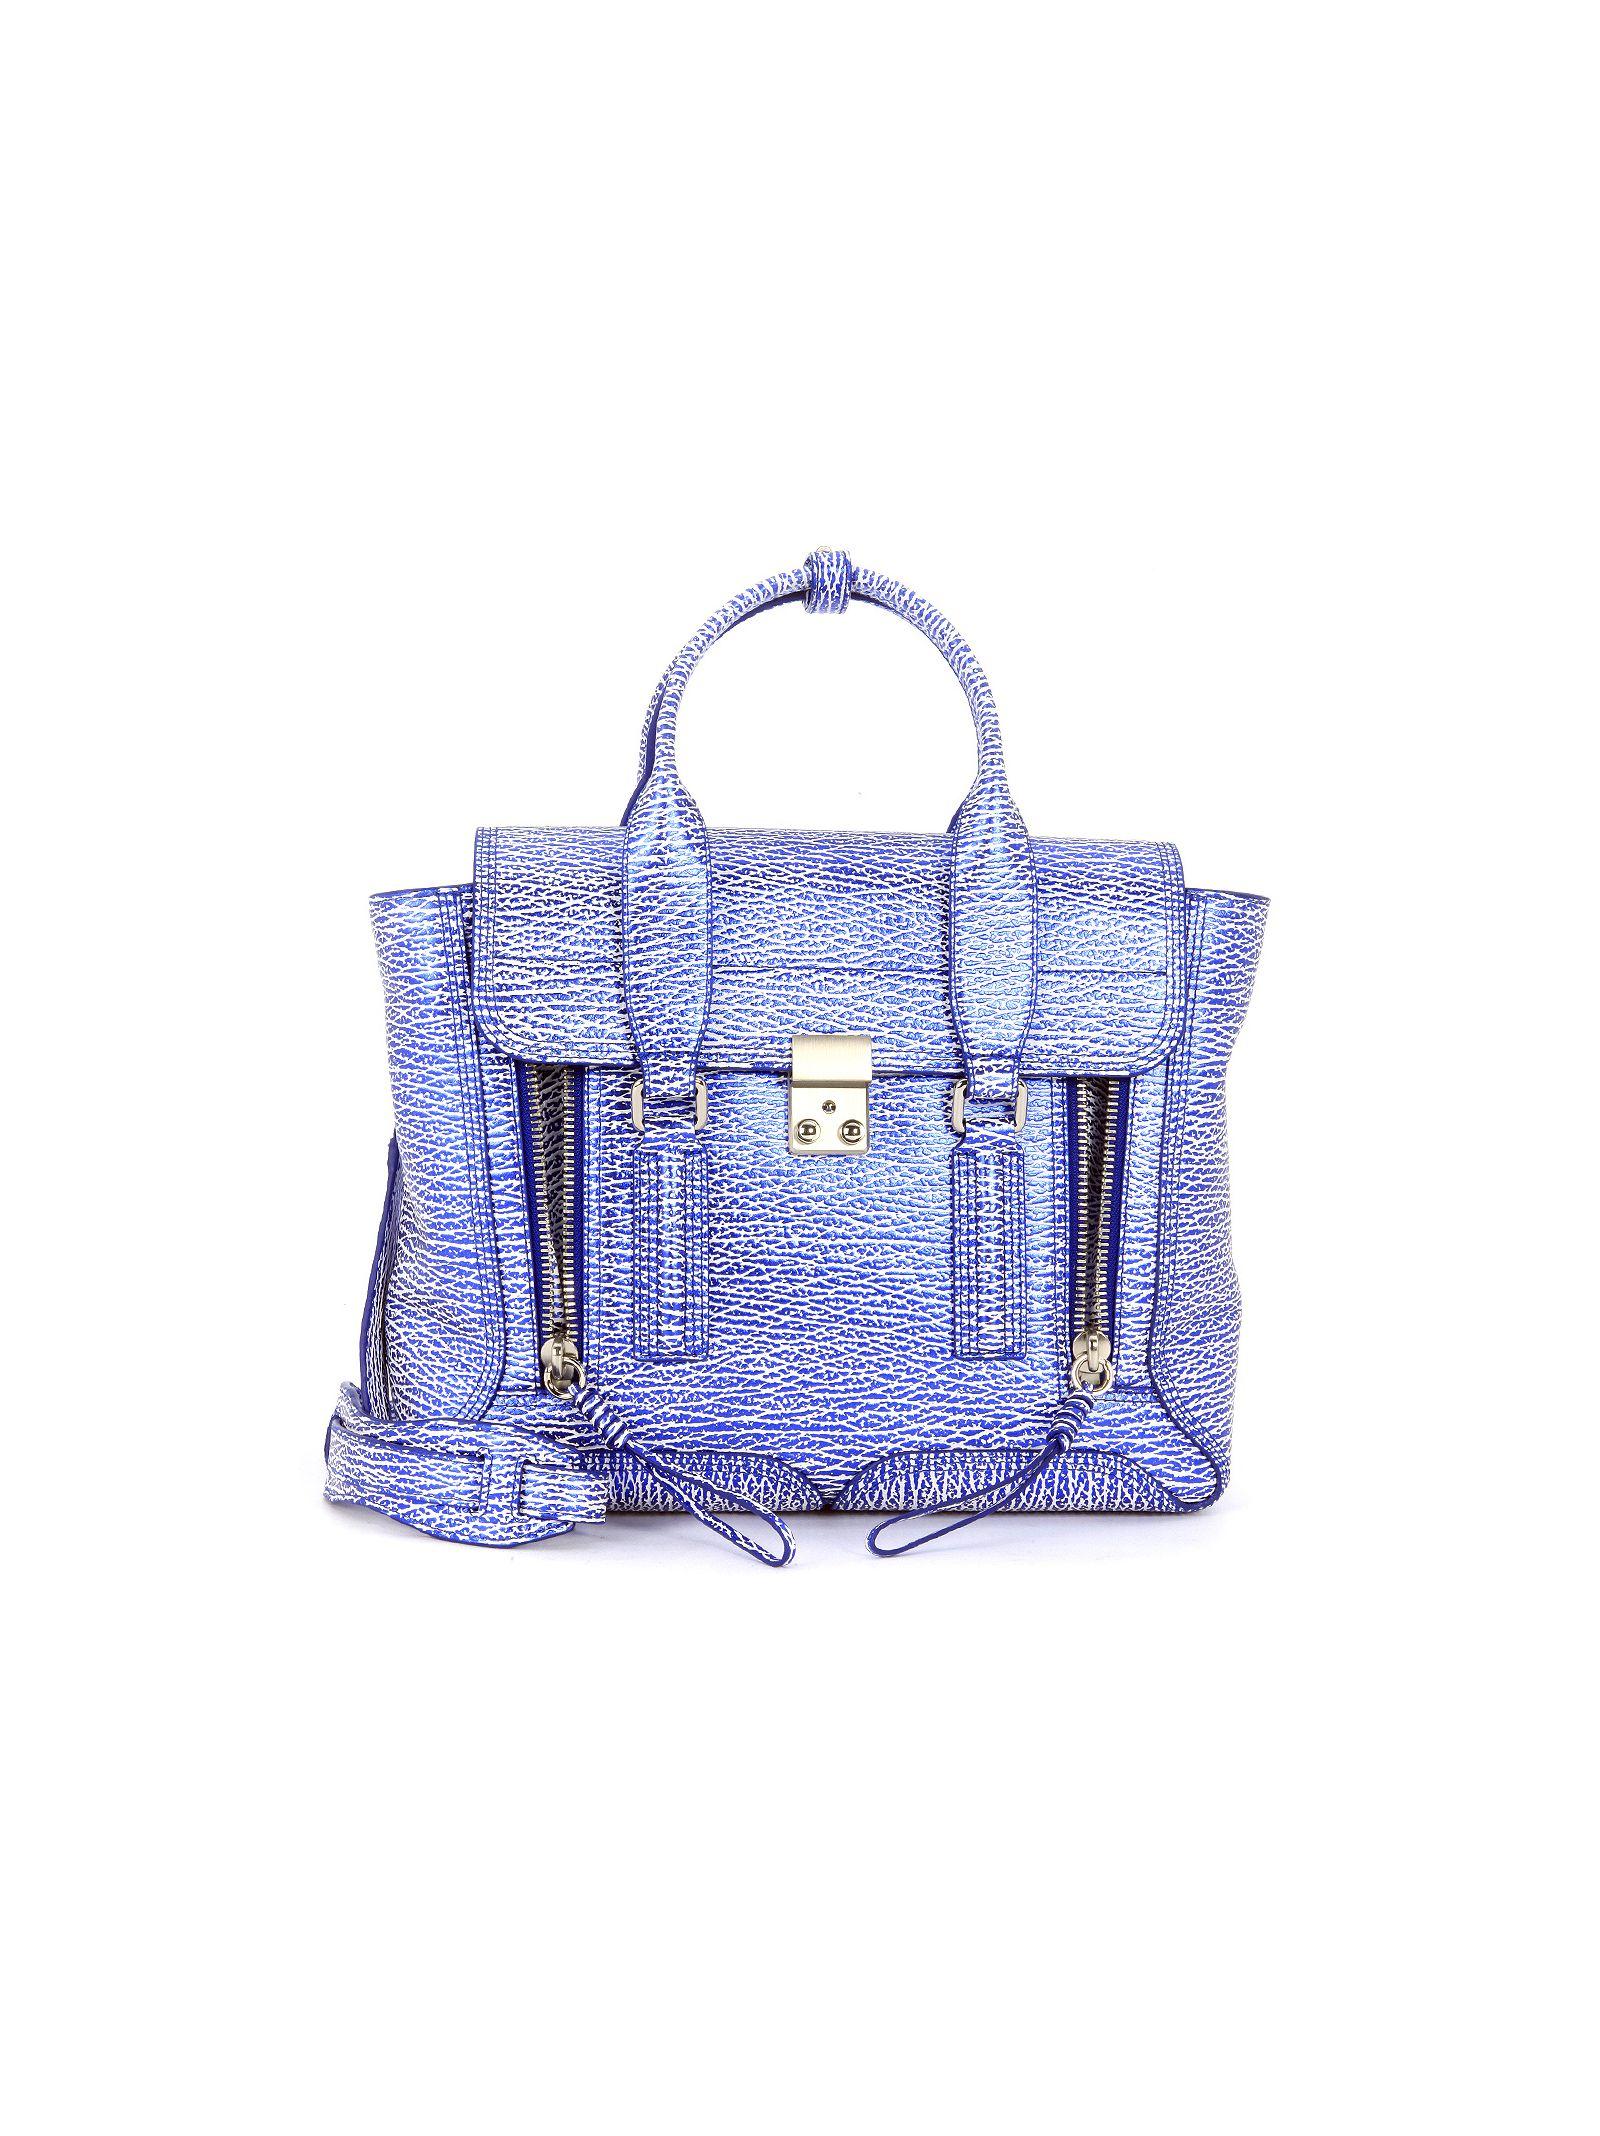 3.1 Phillip Lim Pashli Medium Satchel In White And Blue Leather